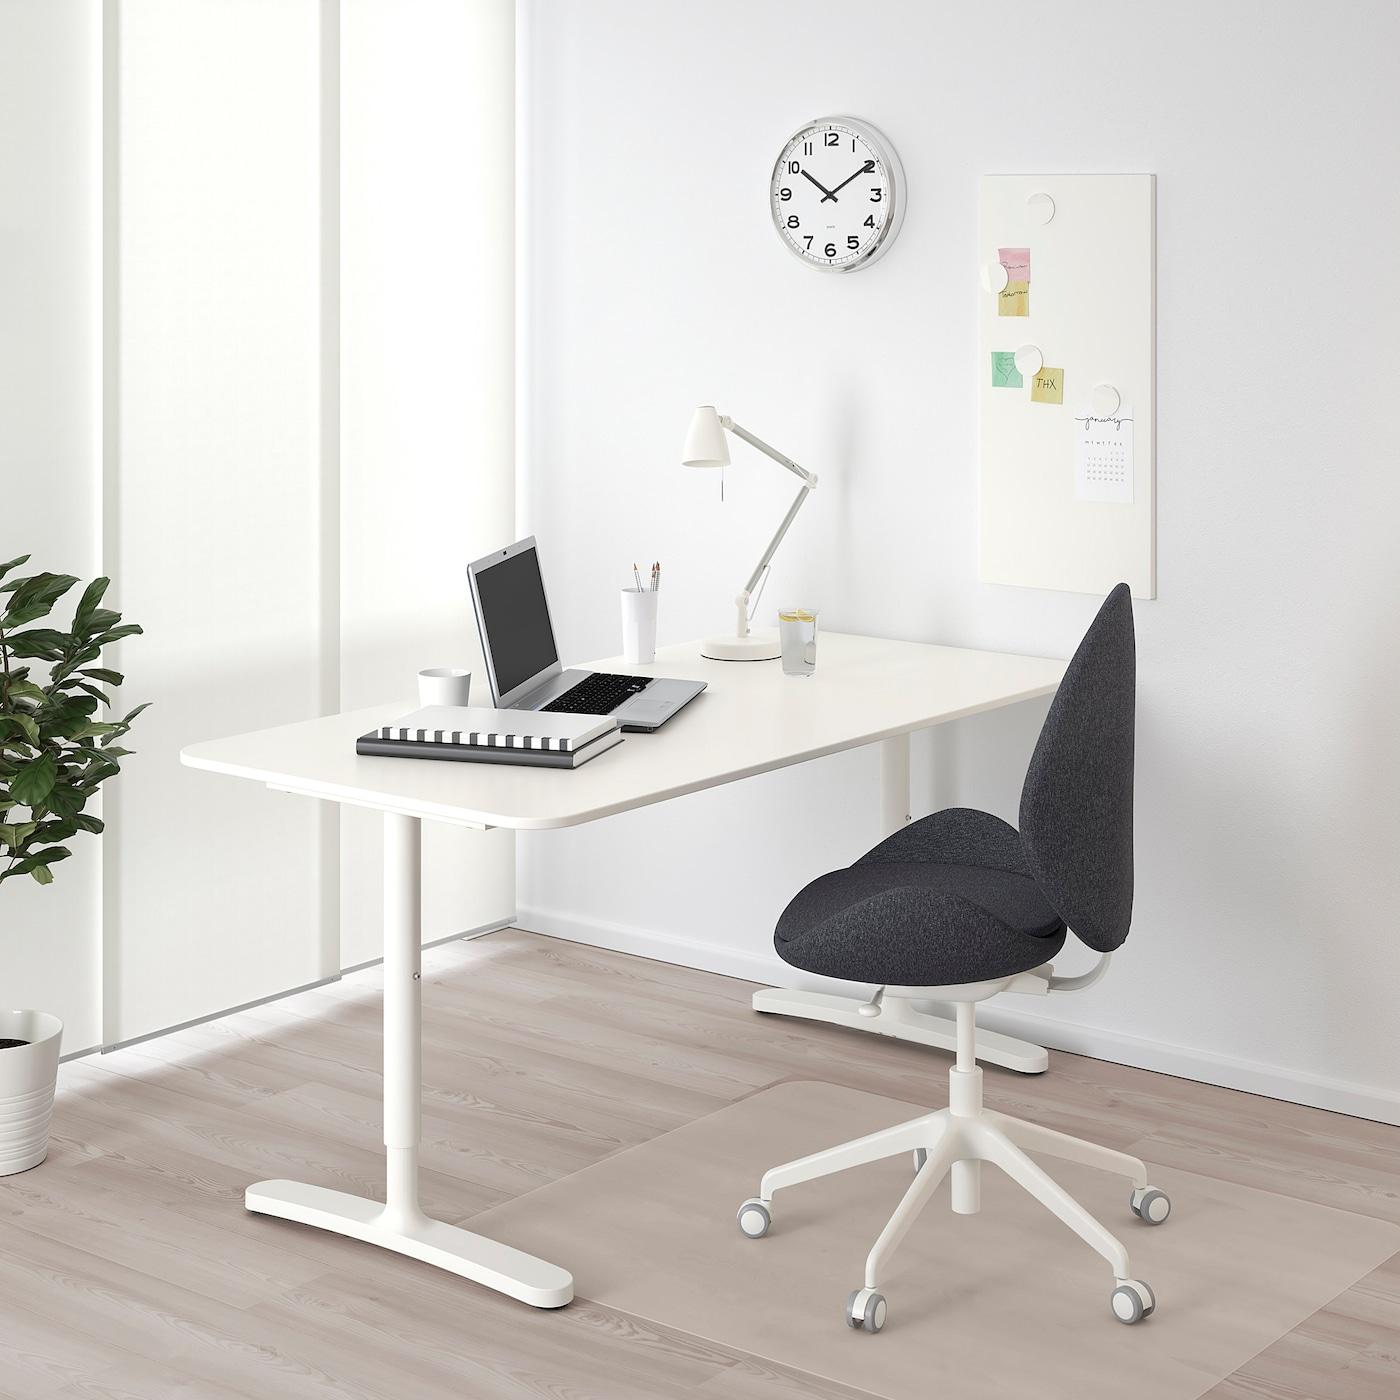 BEKANT 베칸트 책상, 화이트, 160x80 cm